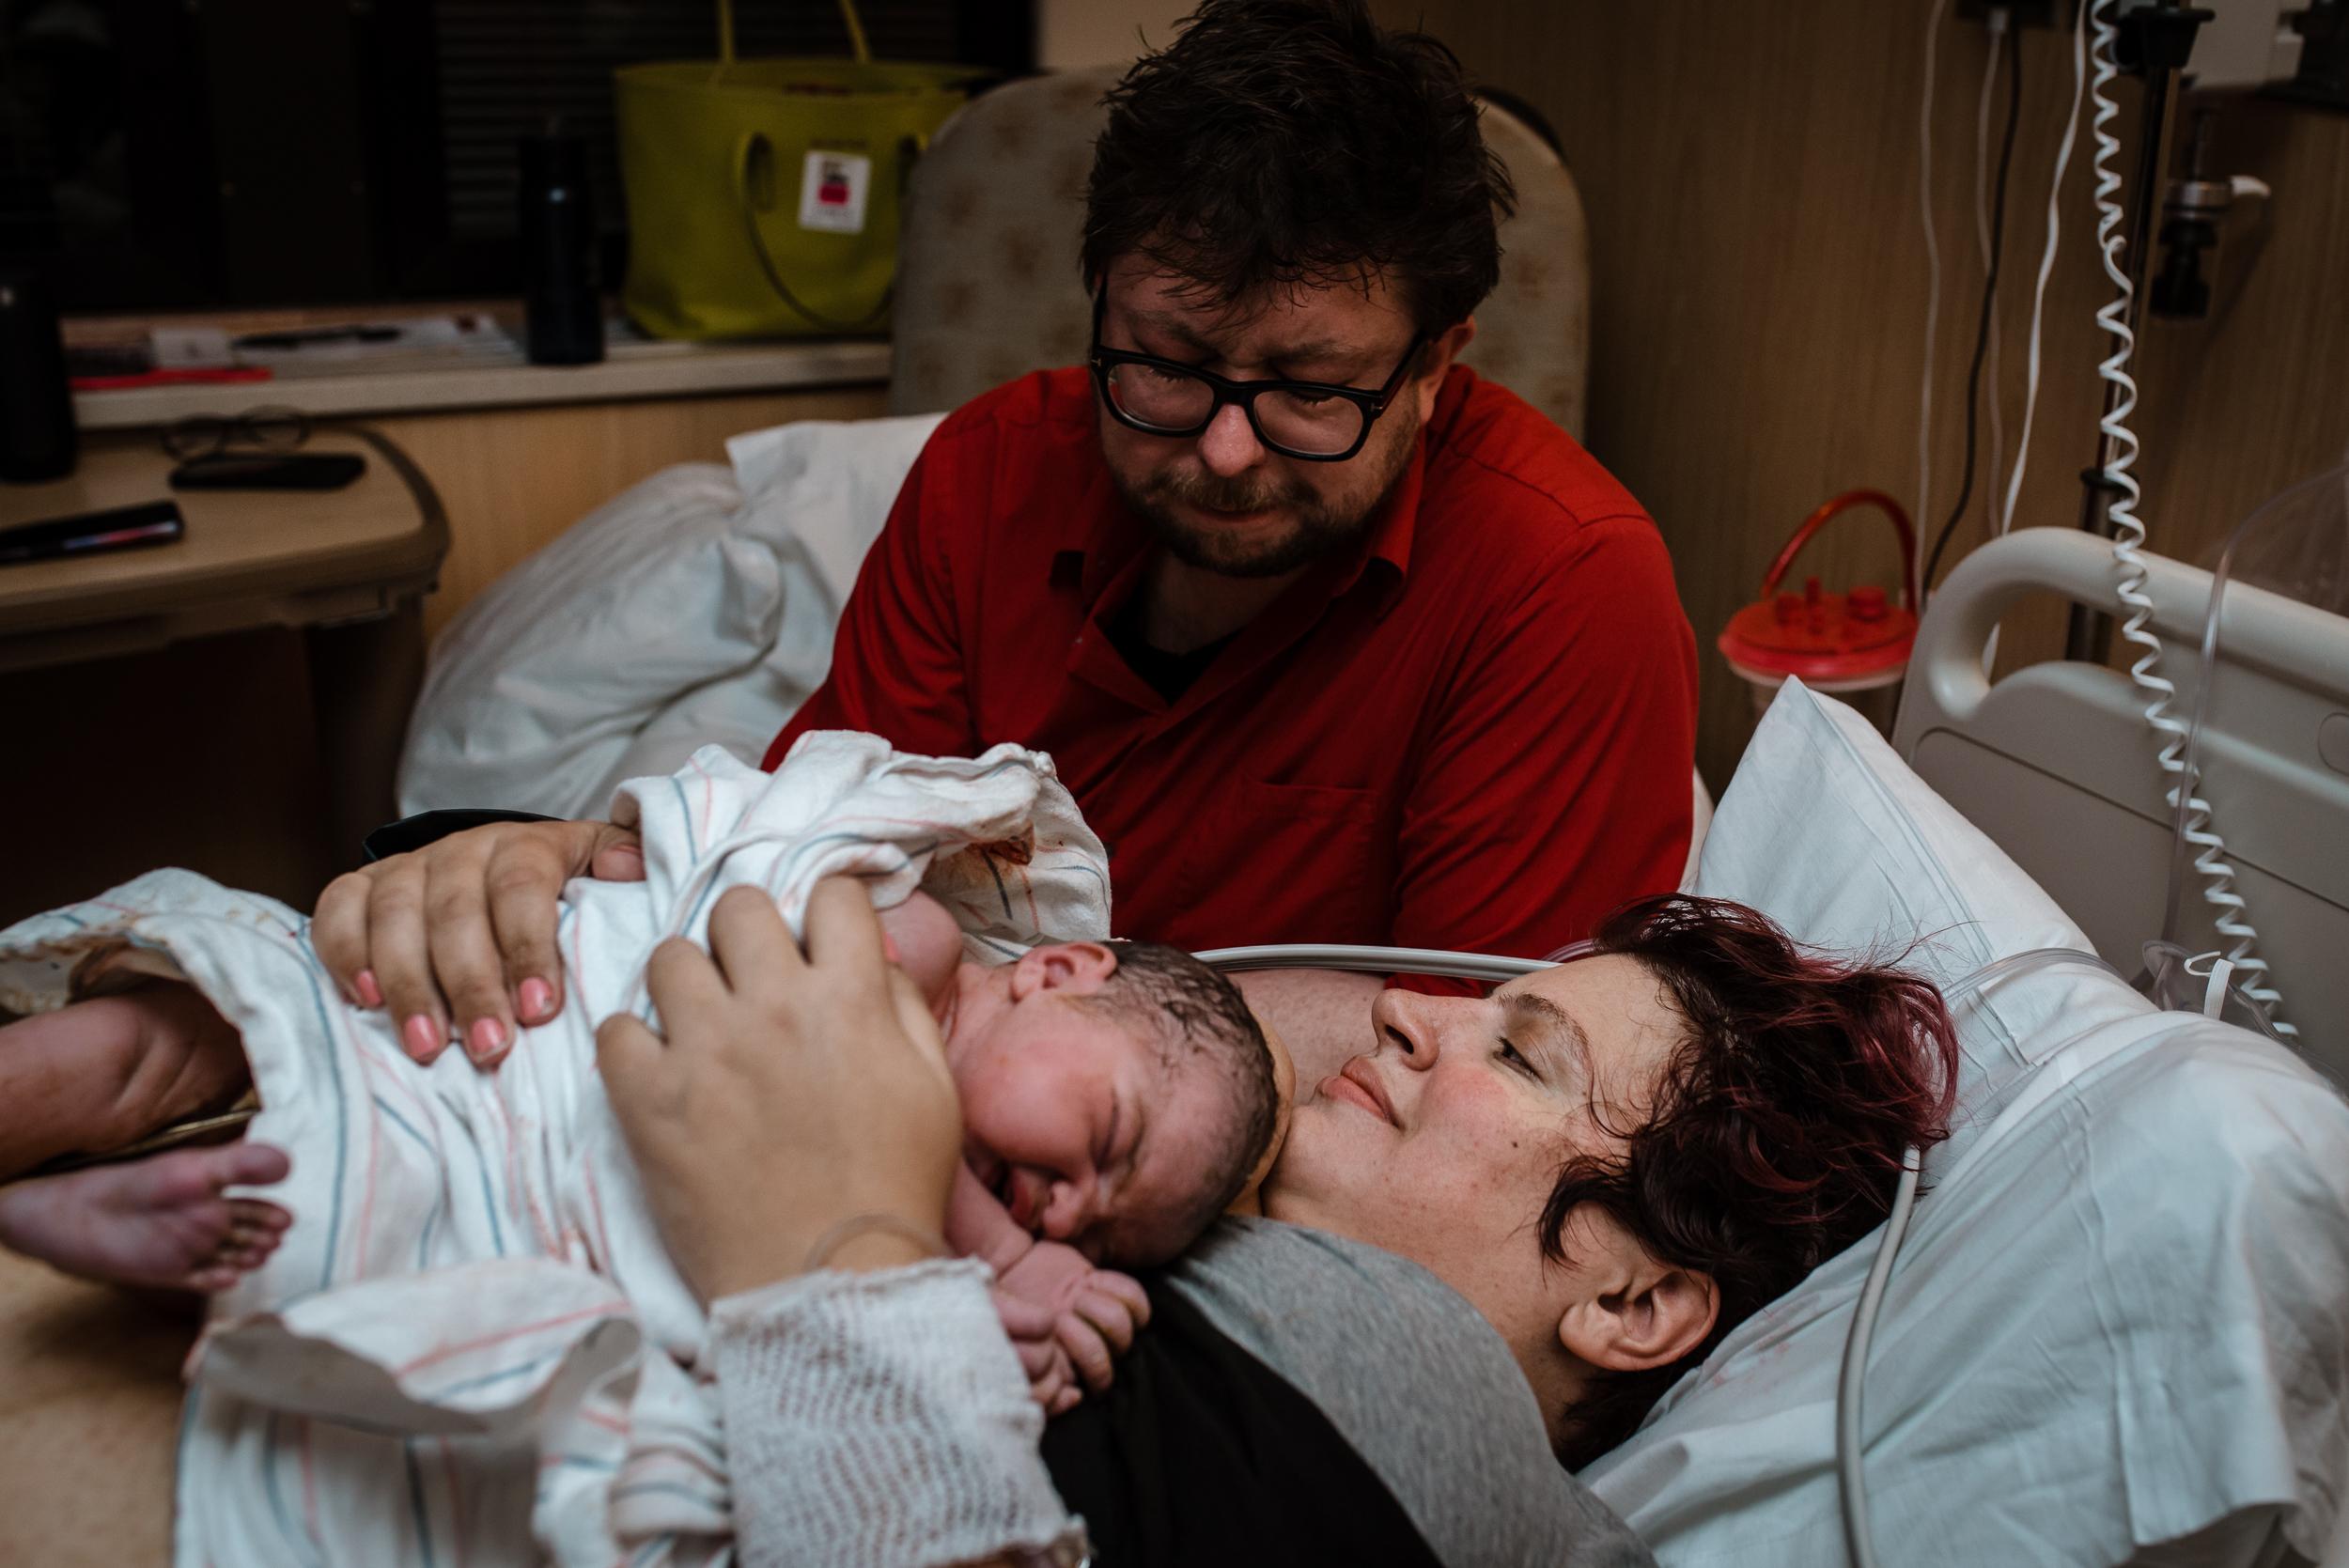 Meredith Westin Photography- Minneapolis Birth Stories and Films-November 08, 2018-160010.jpg